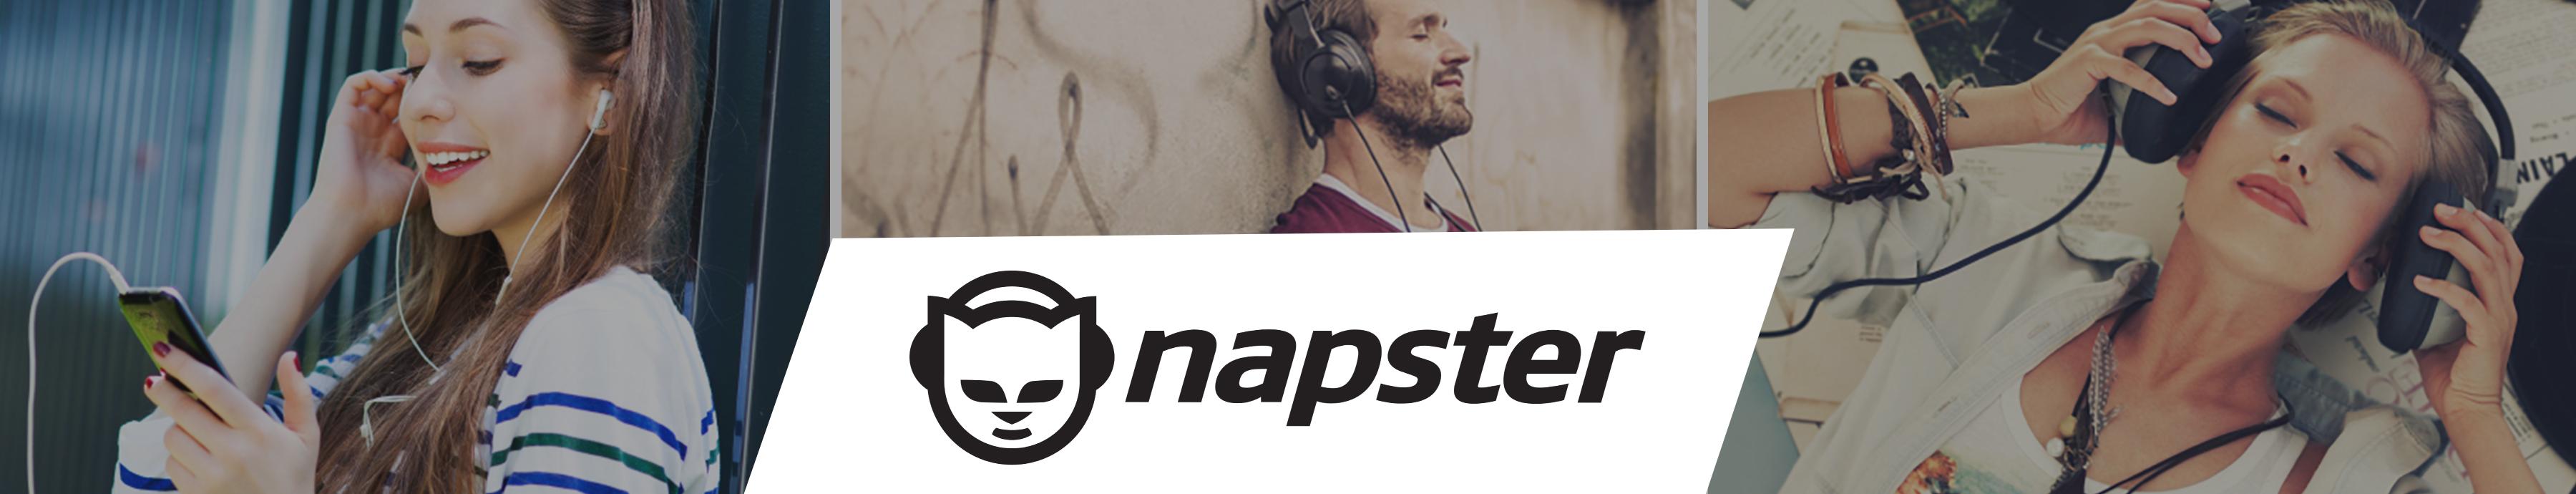 Titelbild Napster bei smartmobil.de